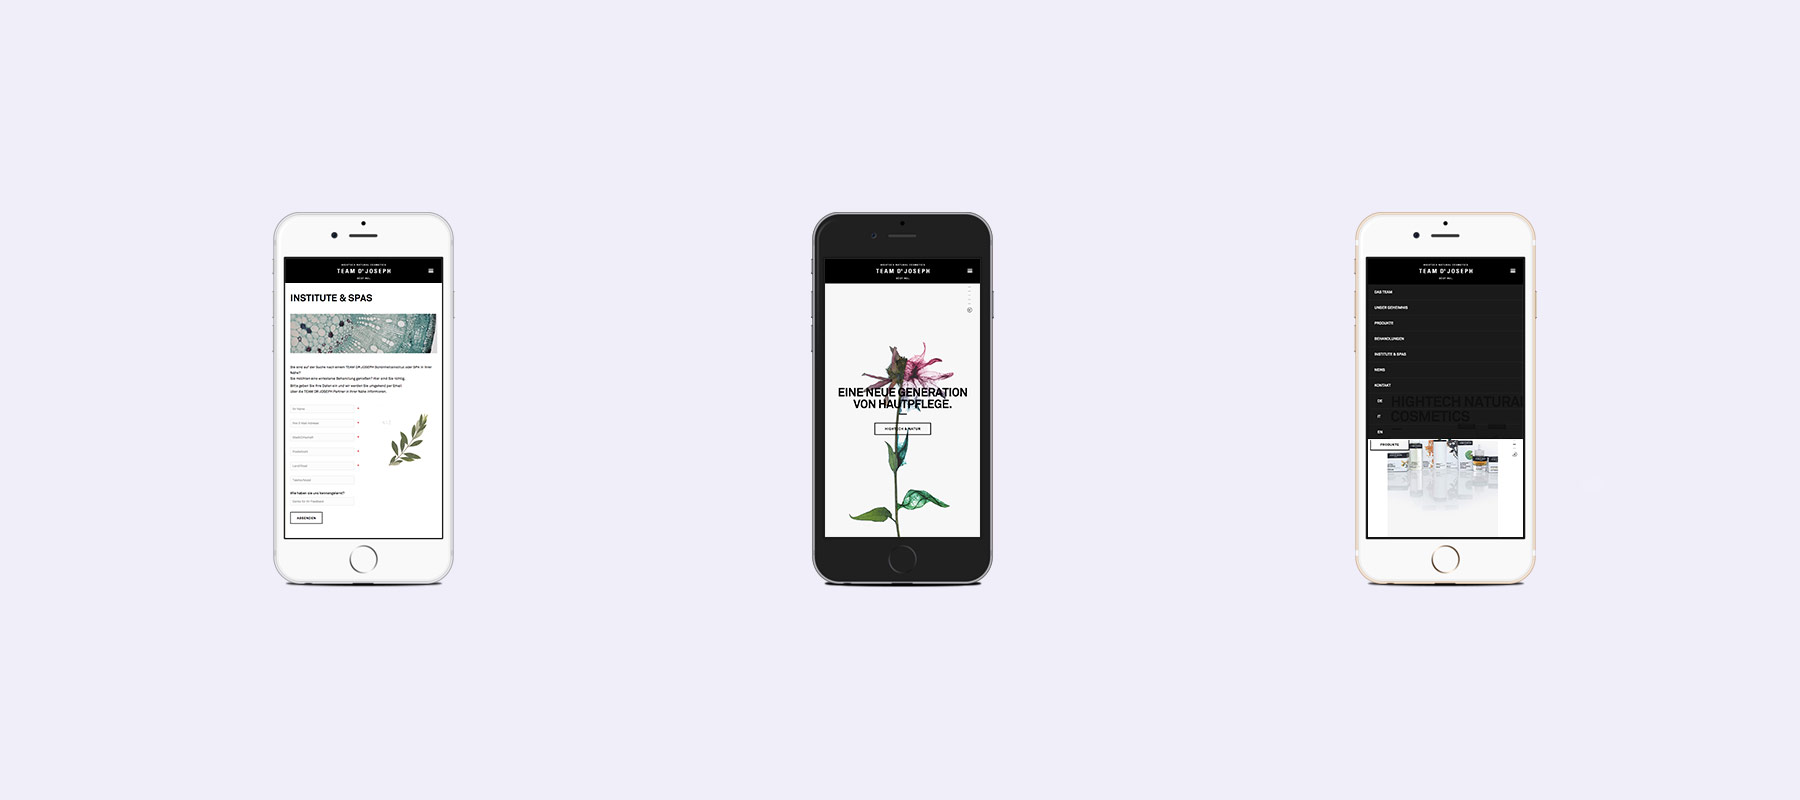 TDrJ_Mobile